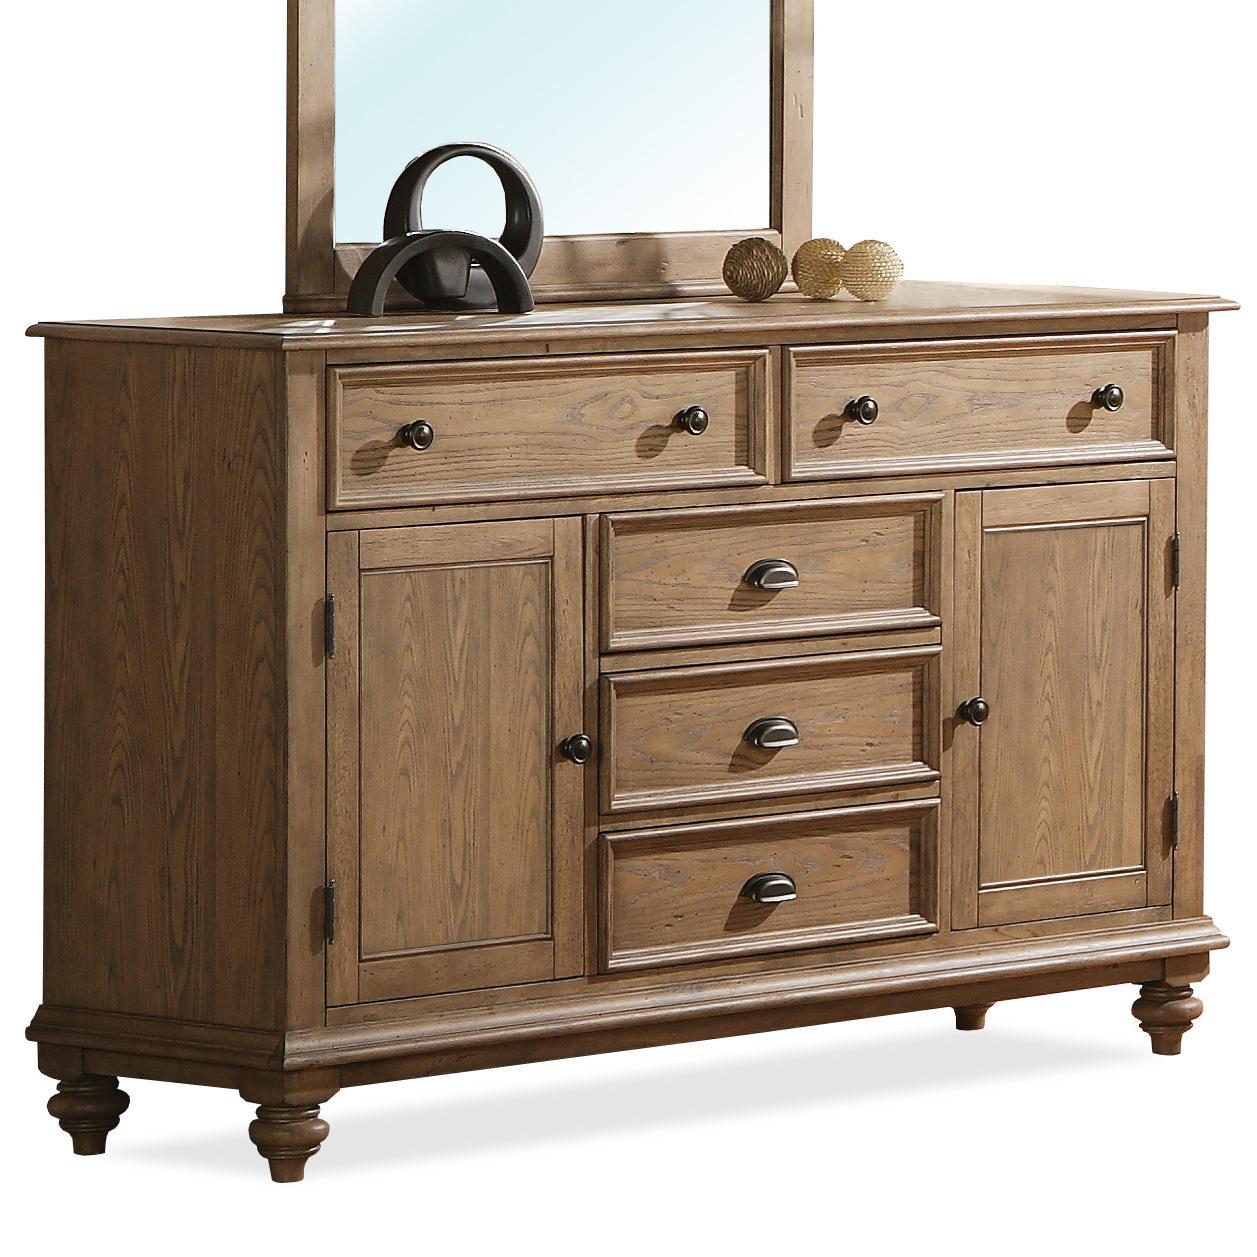 Riverside Furniture Coventry Panel Door Dresser - Item Number: 32462